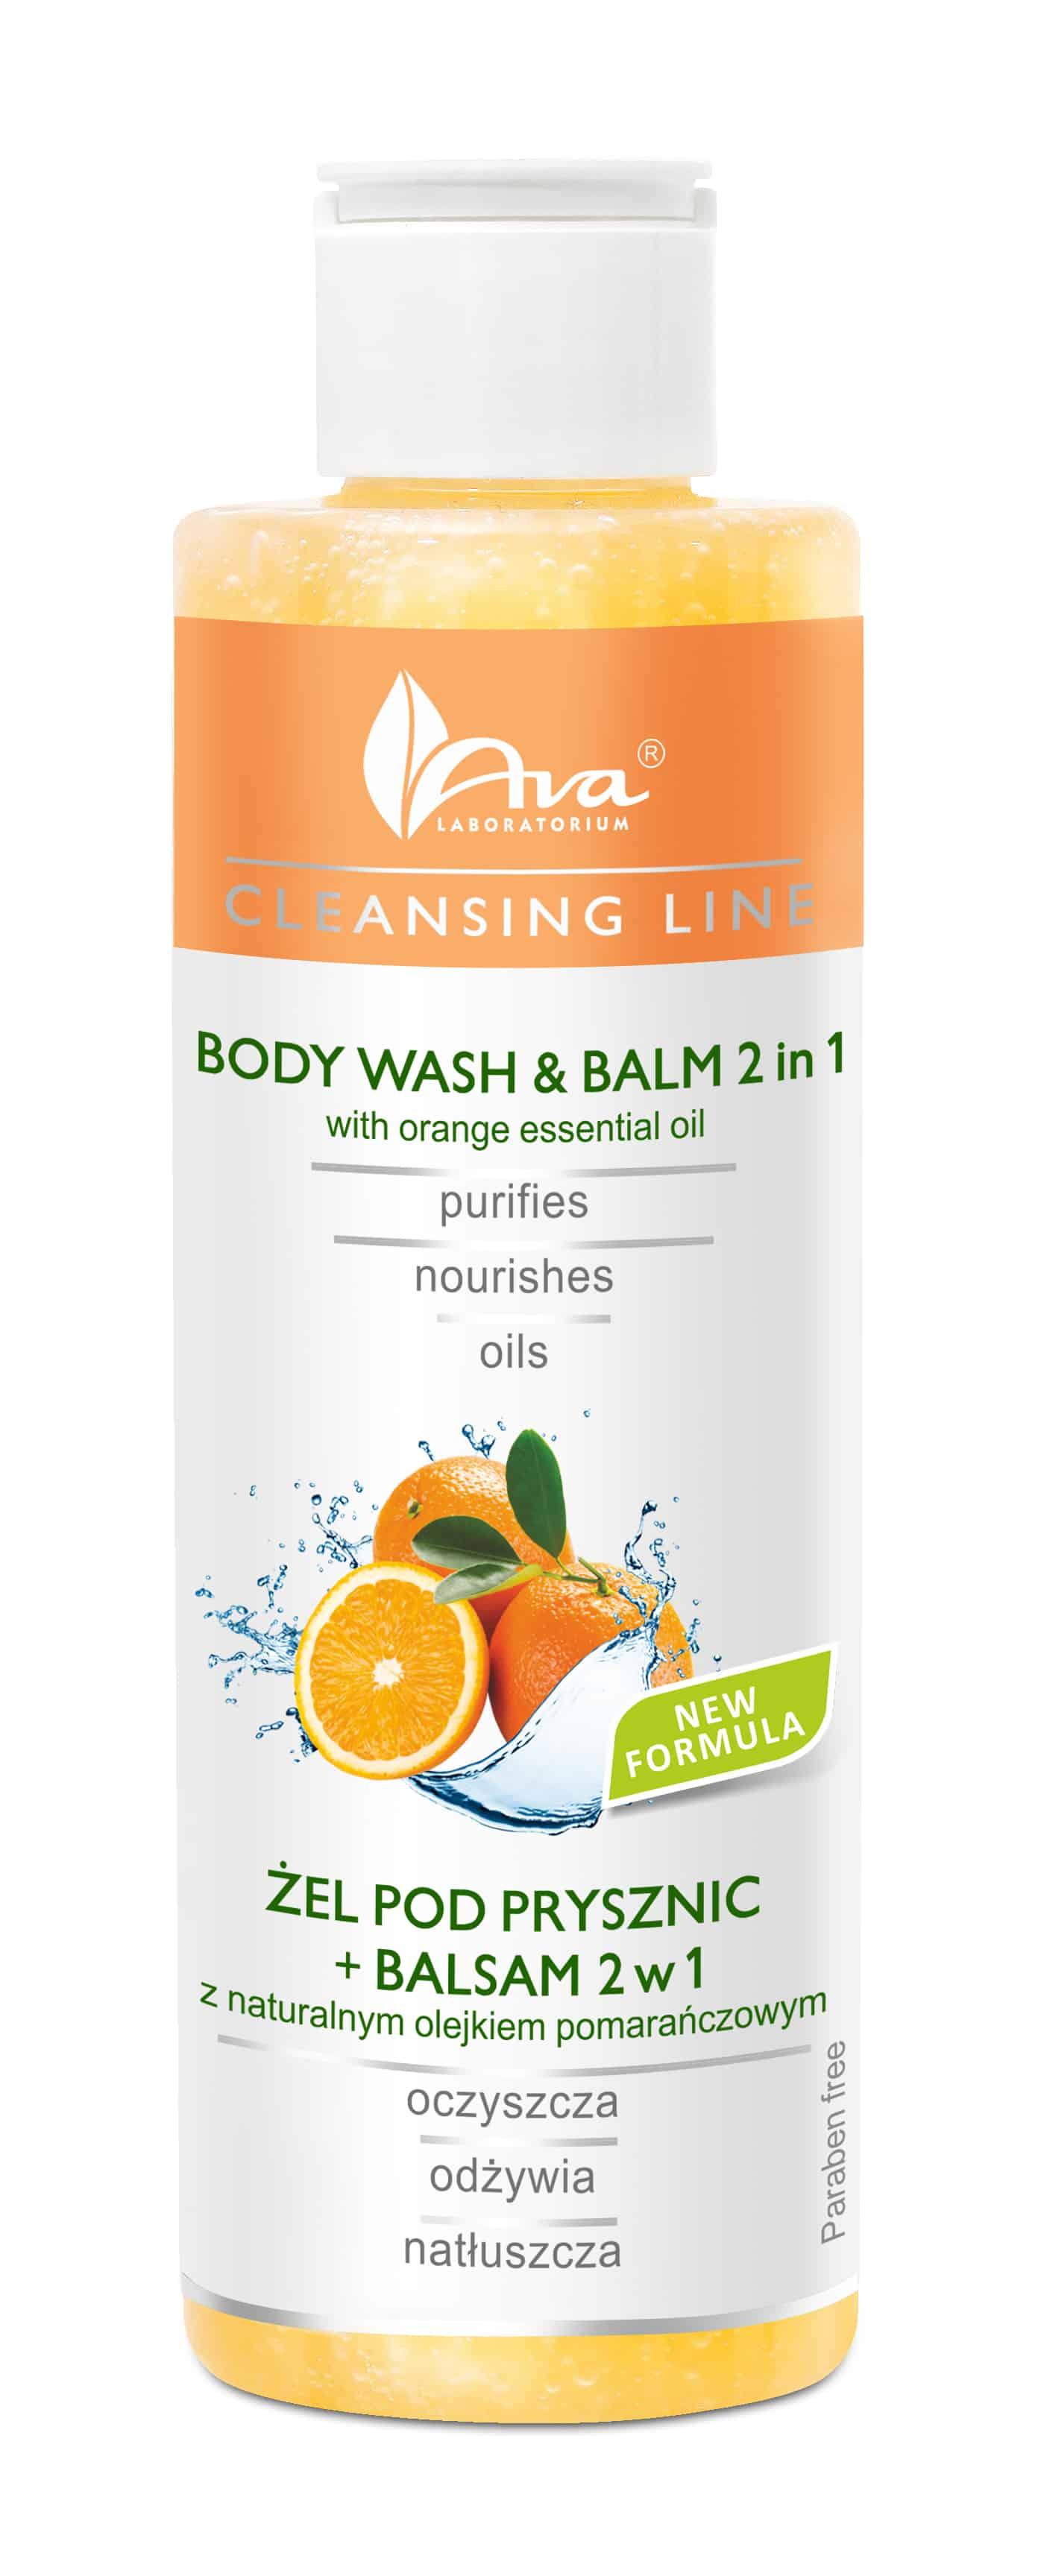 body wash & balm 2in1